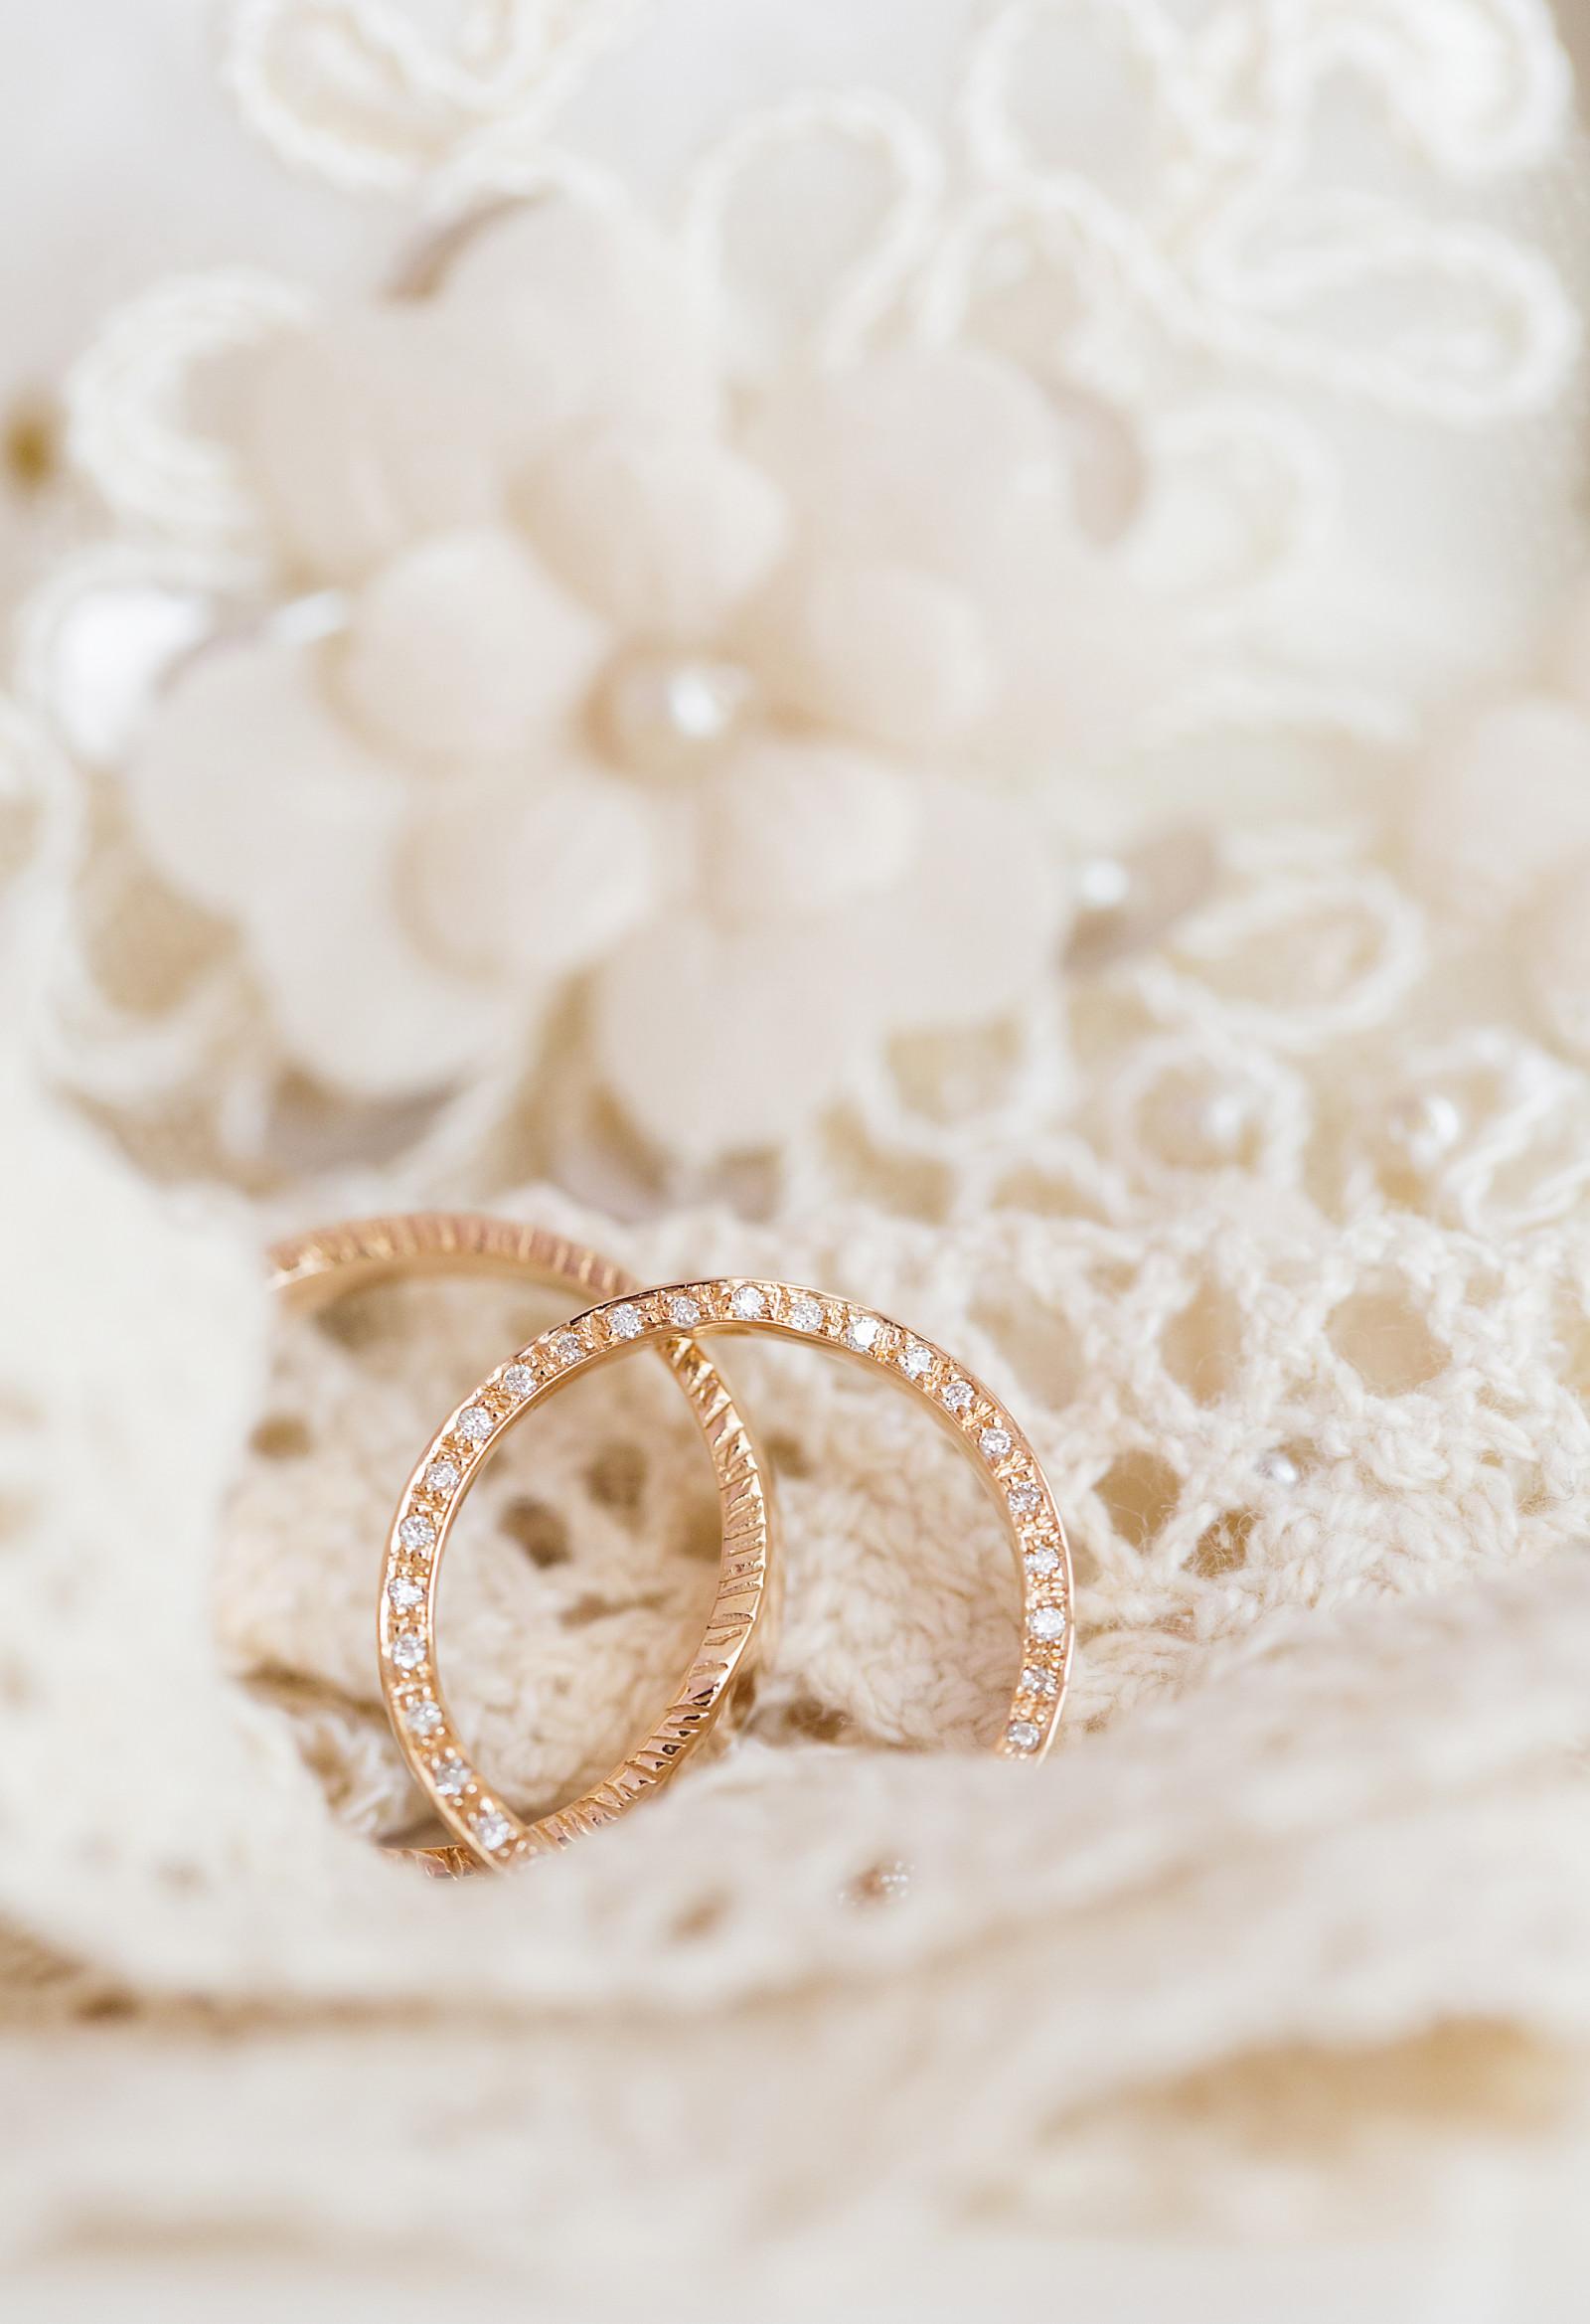 Marianna-Lanzilli-Spose-Made-In-Italy